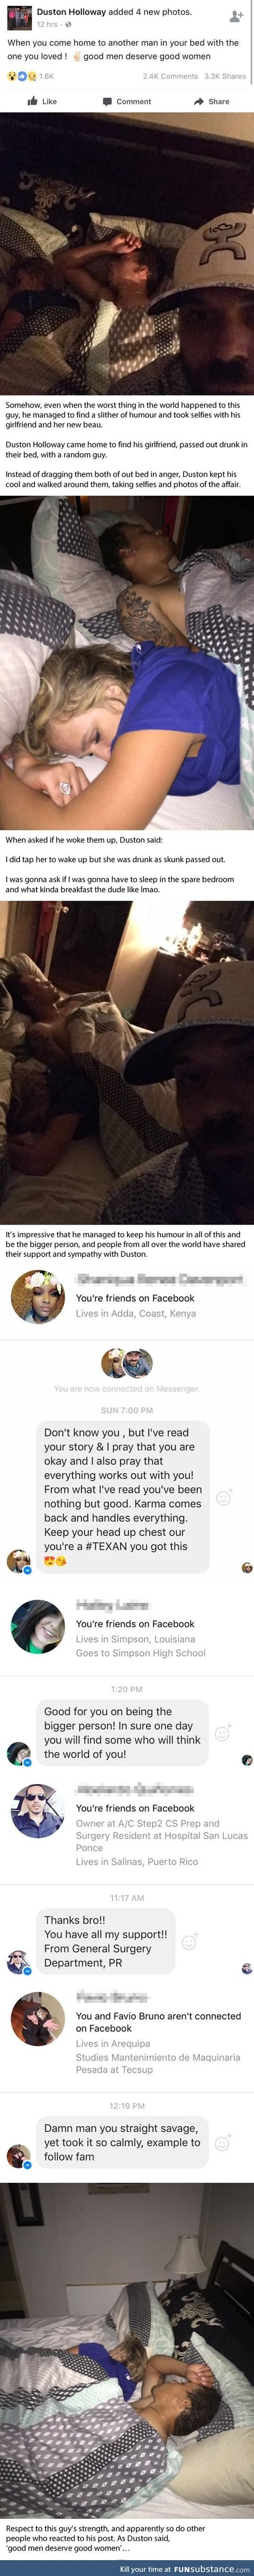 Caught his girl cheating, took selfies